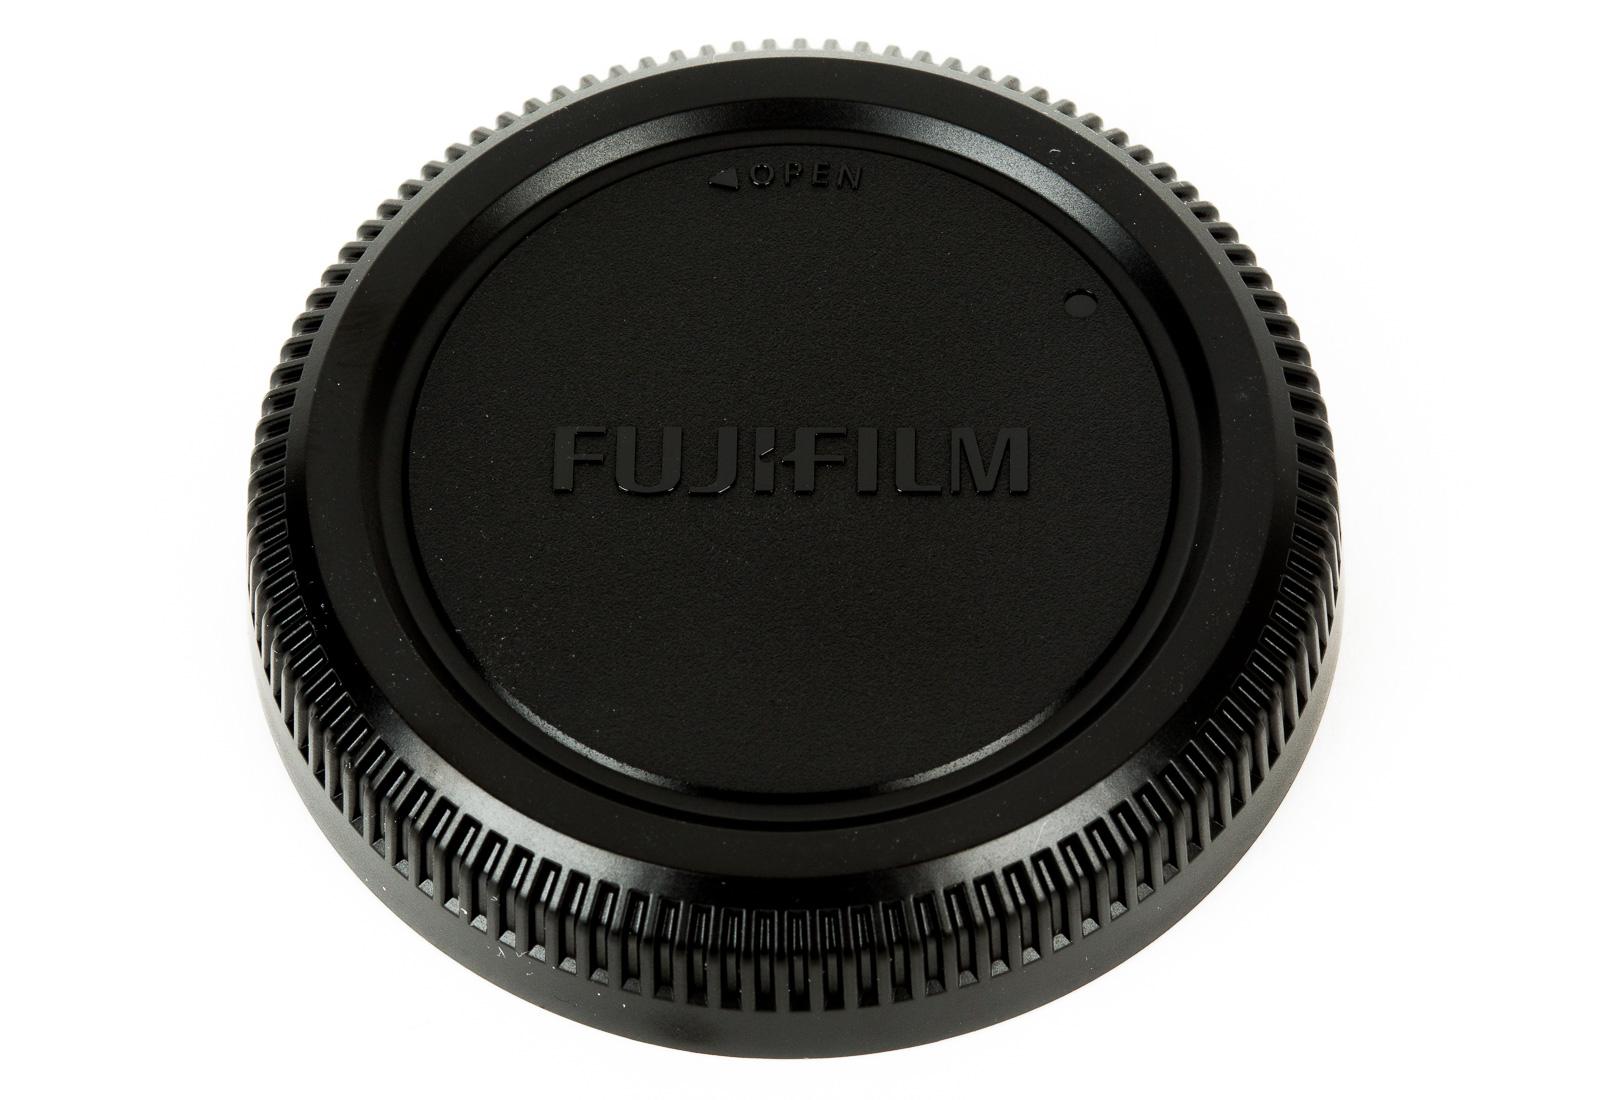 Rent A Fuji Gf 120mm F 4 Macro R Lm Ois Wr At Fujinon Fujifilm Rlcp 002 Medium Format Rear Lens Cap